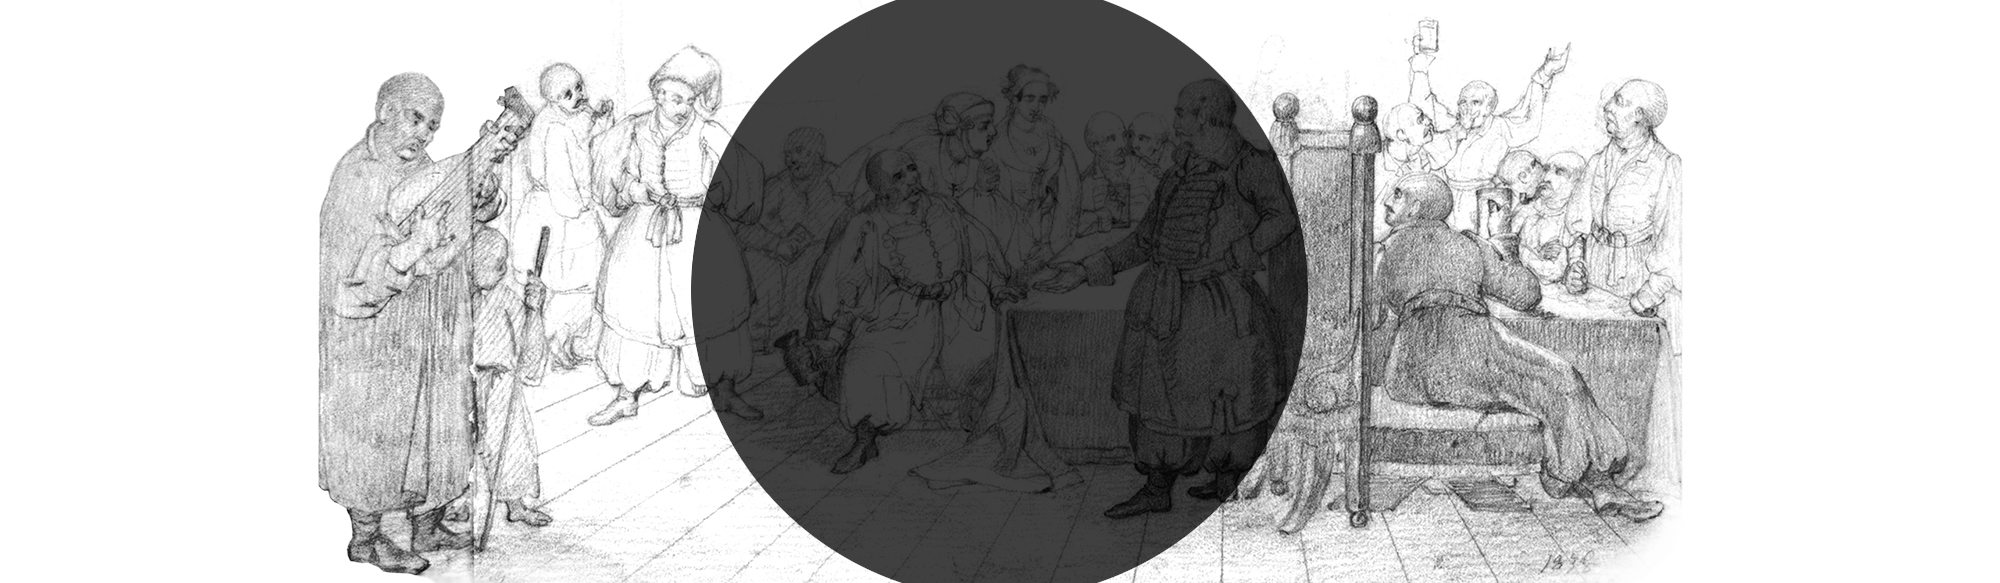 Київська кухня часів Богдана Хмельницького - Частина І: Бенкет у Гетьмана